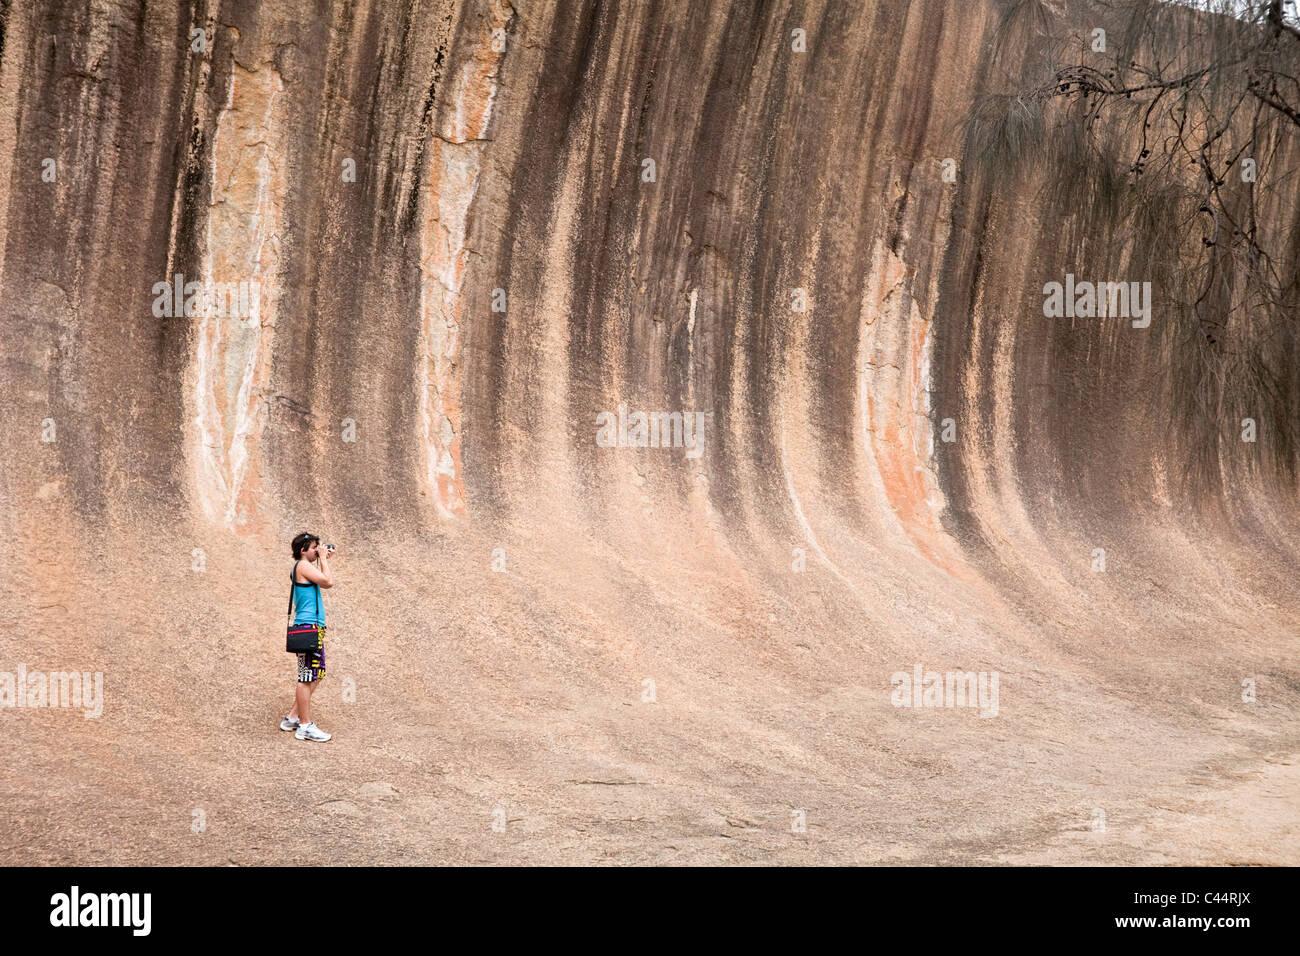 Tourist at Wave Rock - a natural rock formation near Hyden, Western Australia, Australia - Stock Image